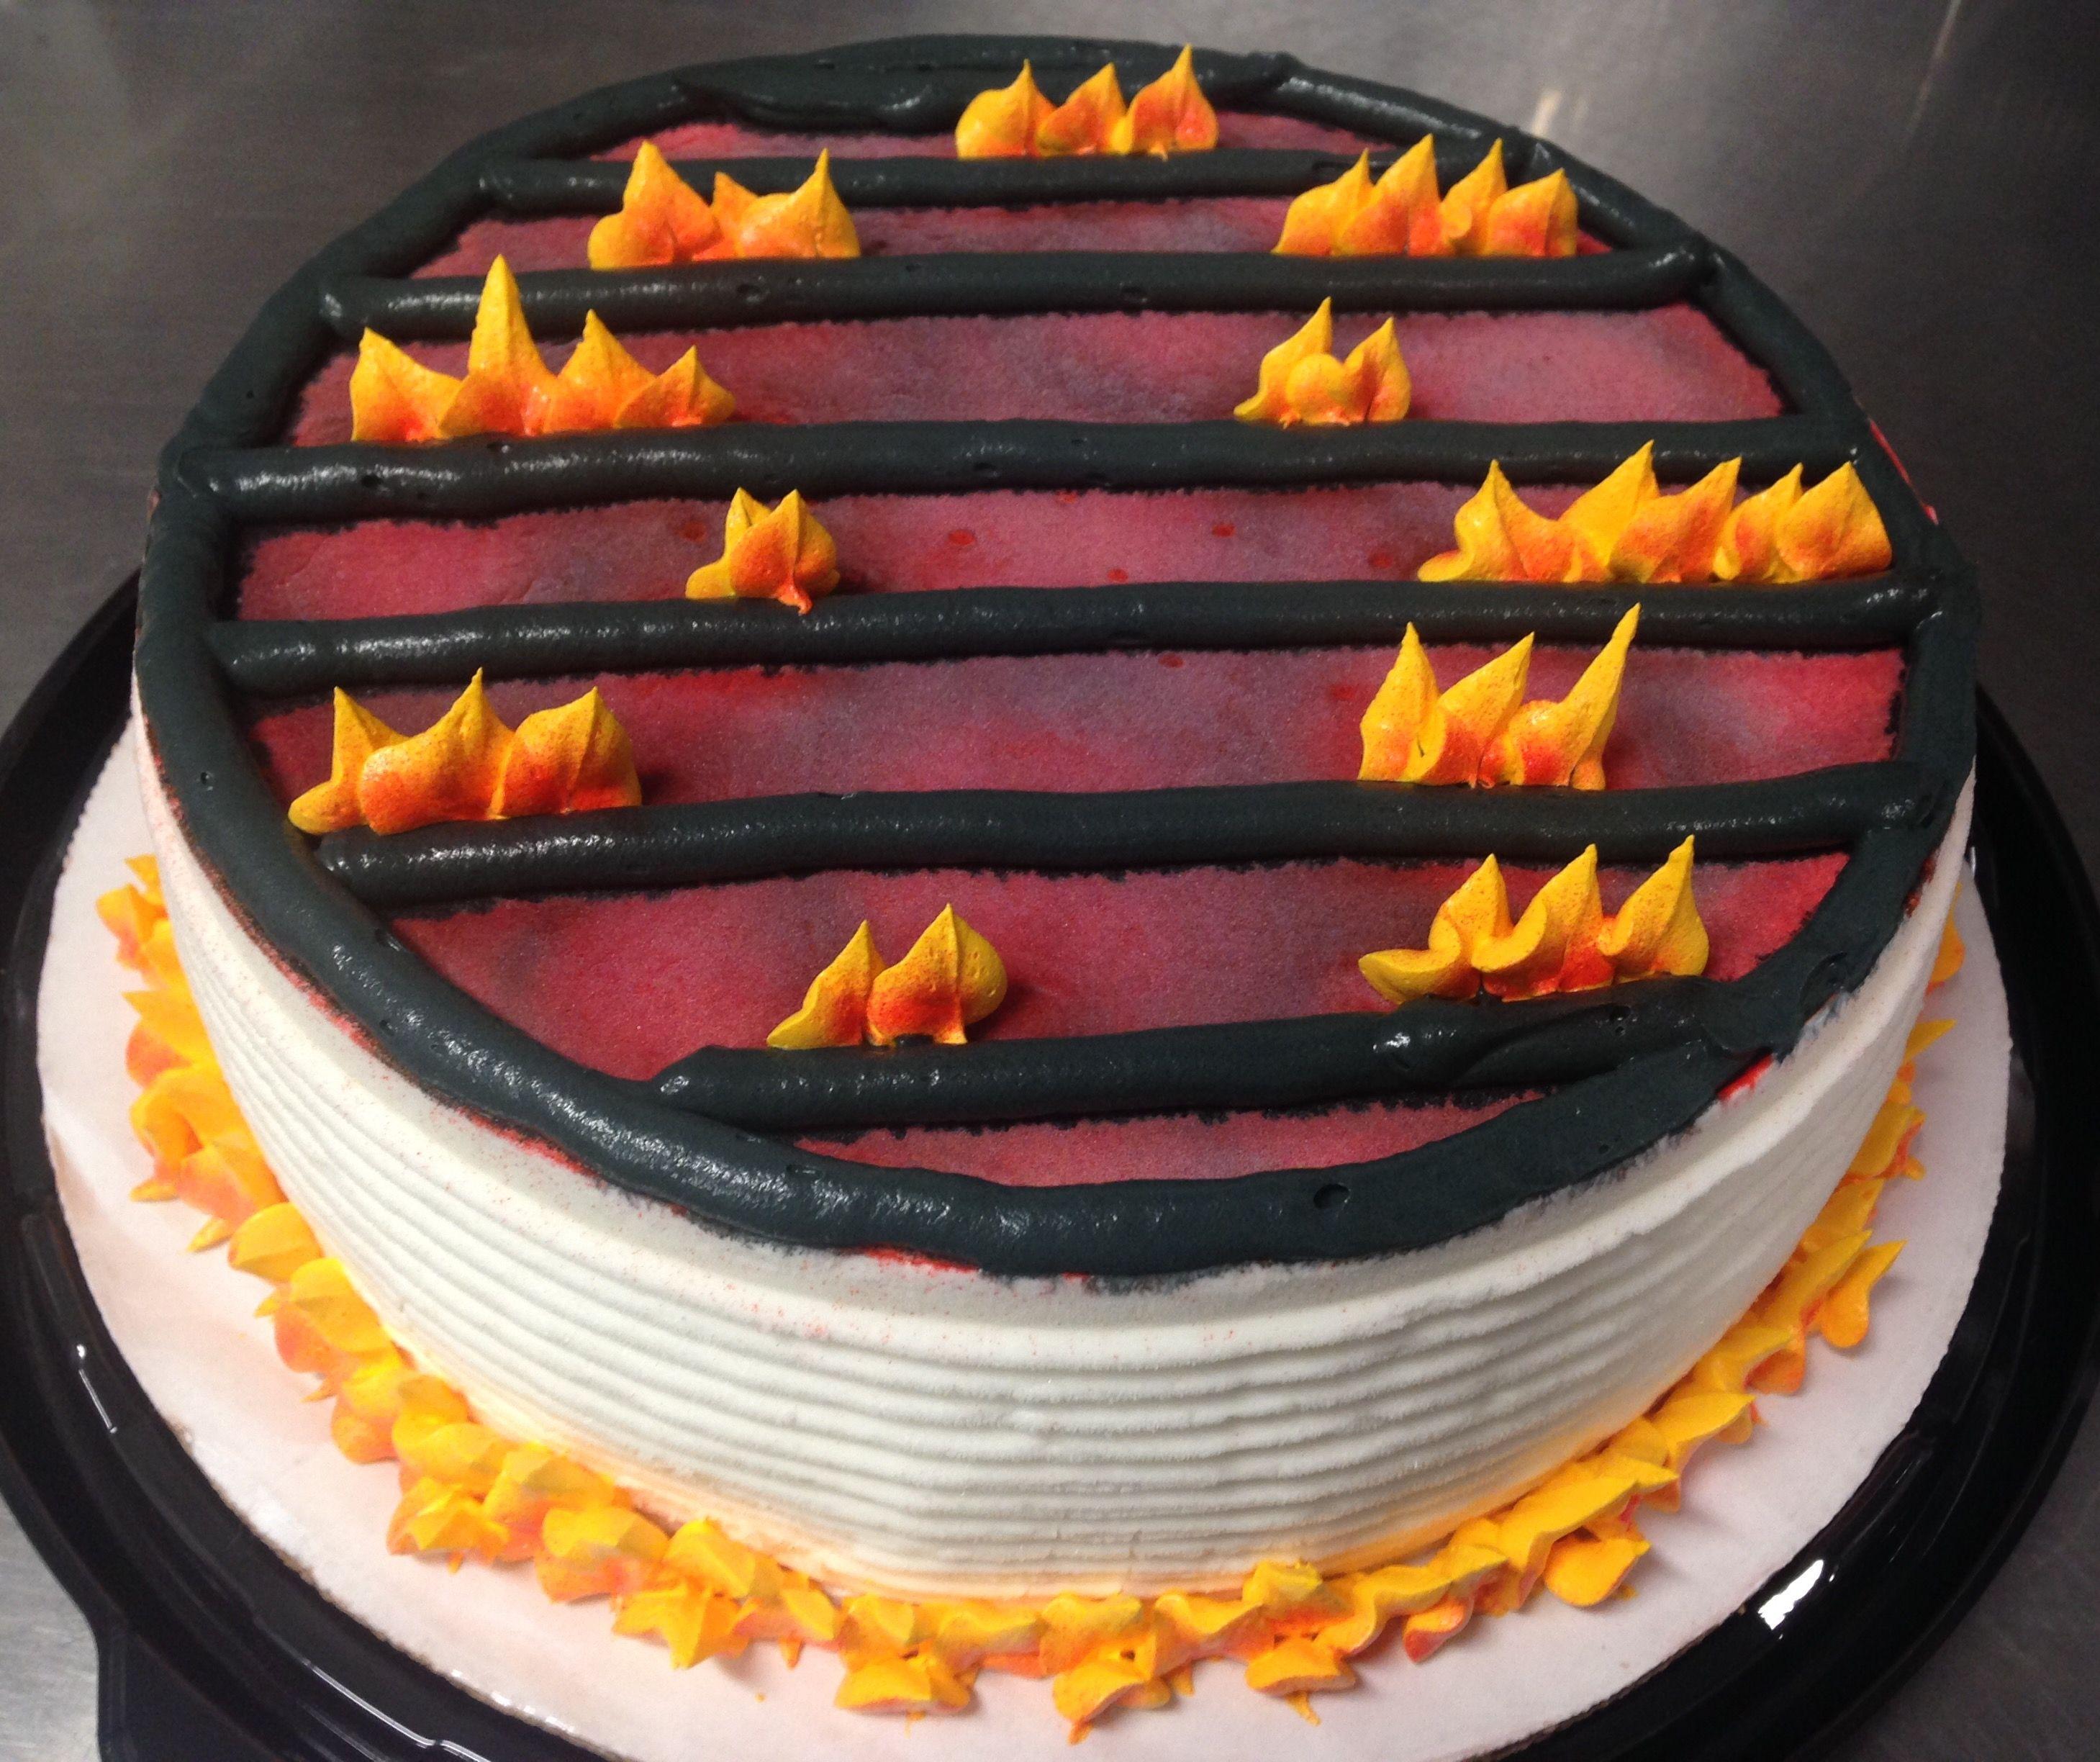 Bbq grill dq ice cream cake bbq cake cake decorating